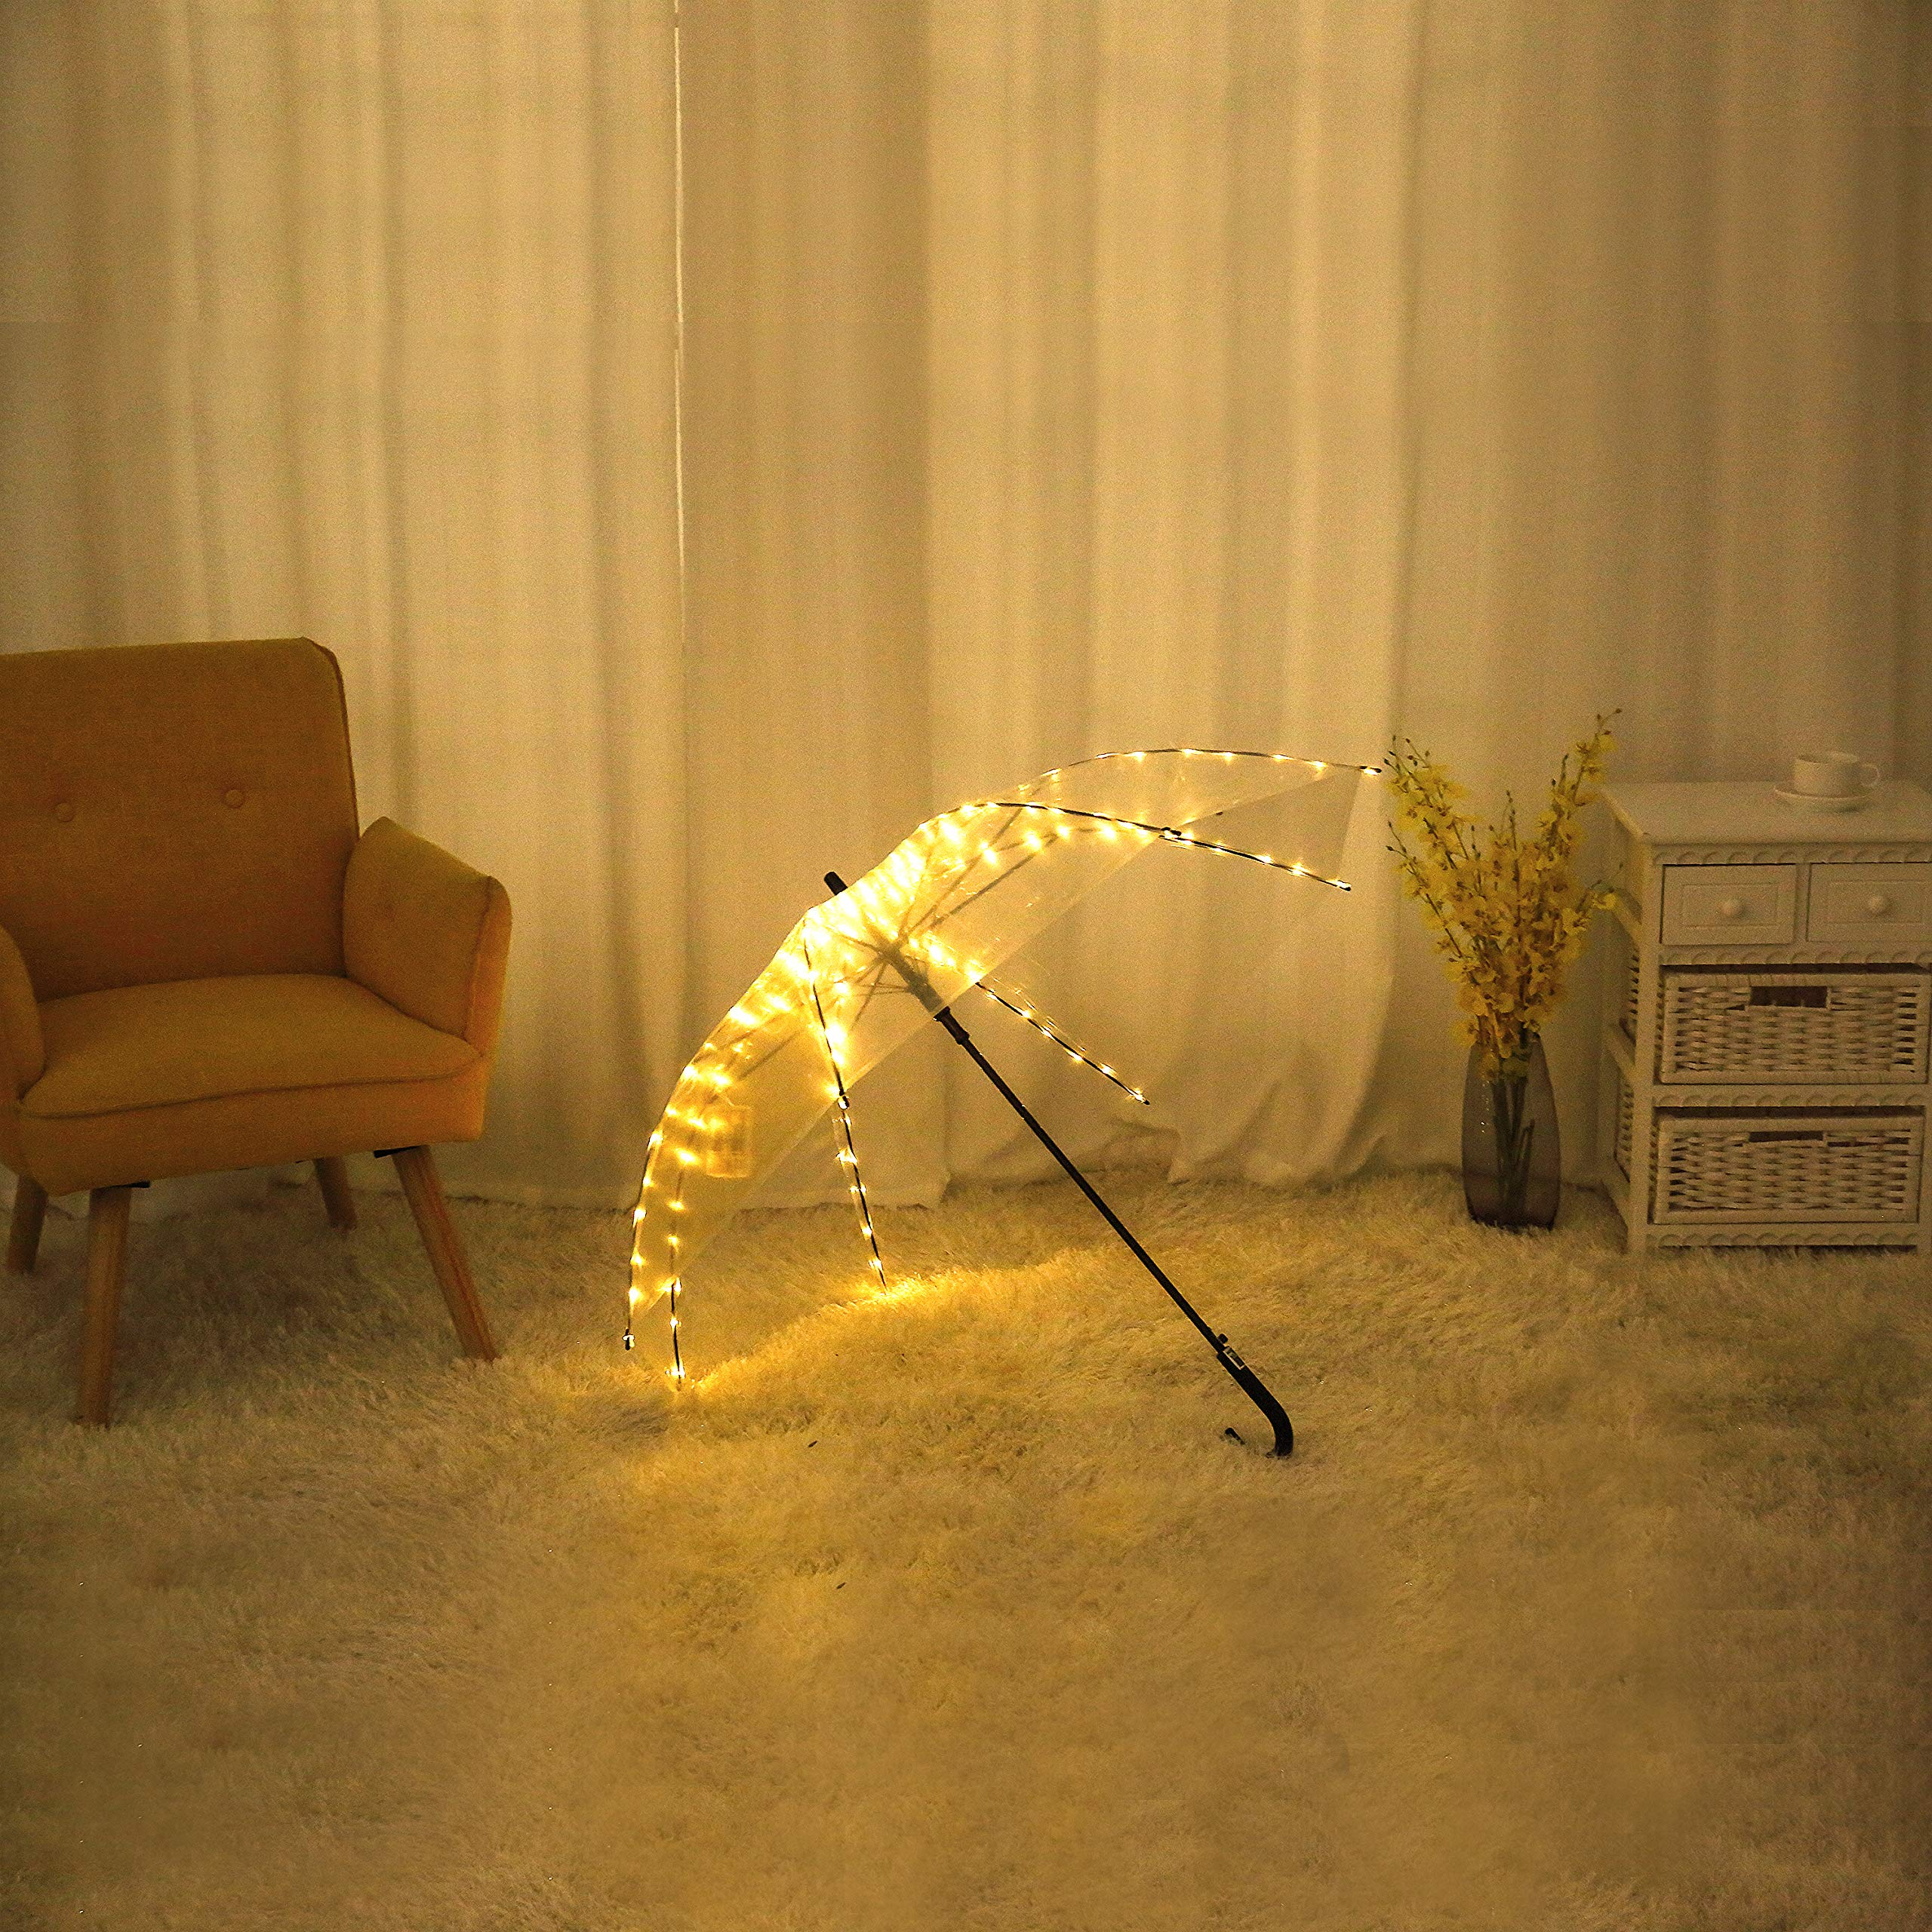 Areskey Transparent Umbrella,LED Light Umbrella,an Transparent Clear Umbrella Including Warm White Starry Lights,104 LED Decor Lights for Wedding,Travel,Summer,Night